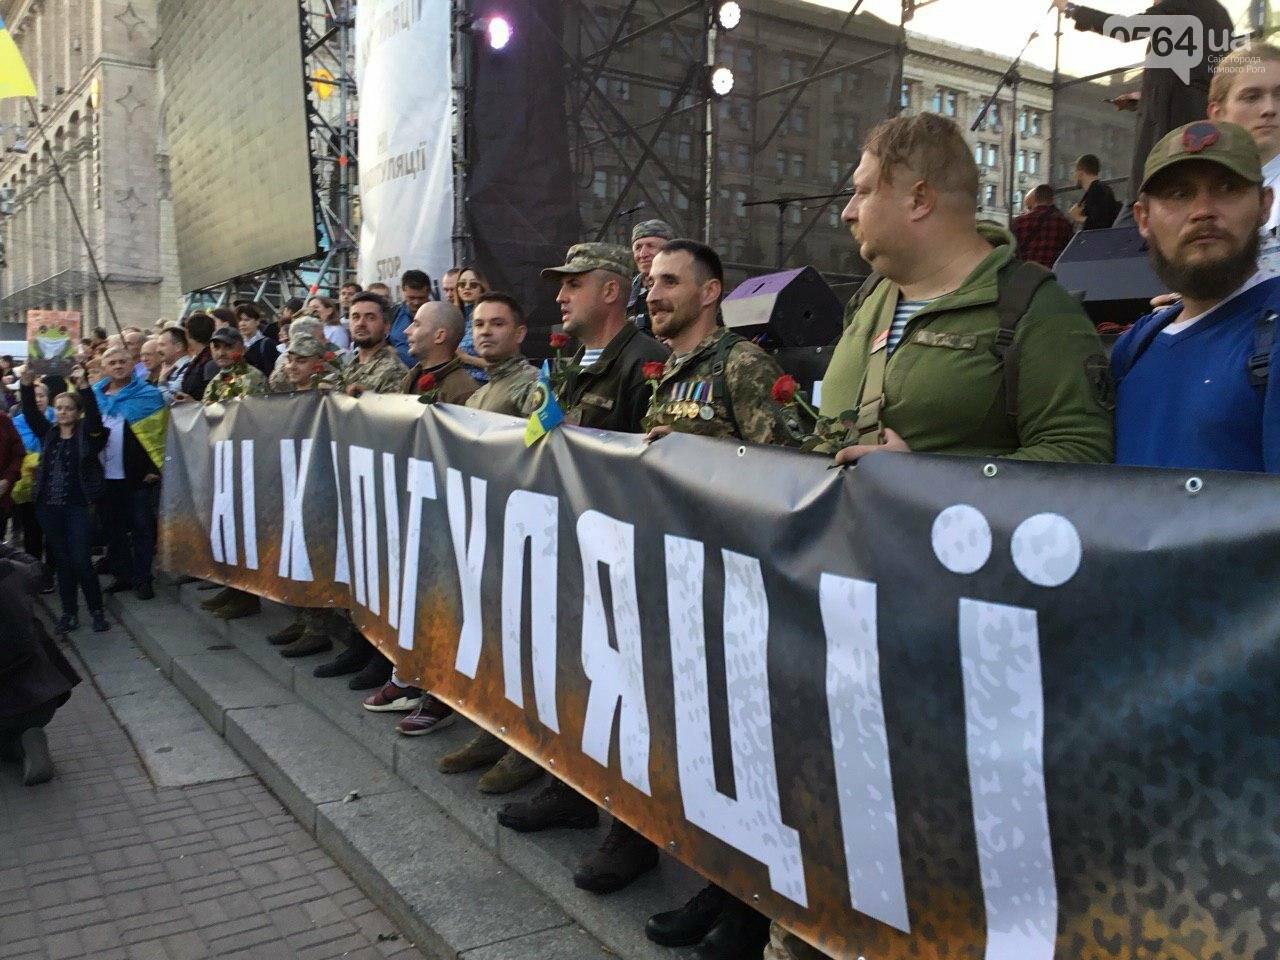 Криворожане поддержали Марш сопротивления капитуляции в Киеве, - ФОТО, ВИДЕО, ОБНОВЛЕНО, фото-38